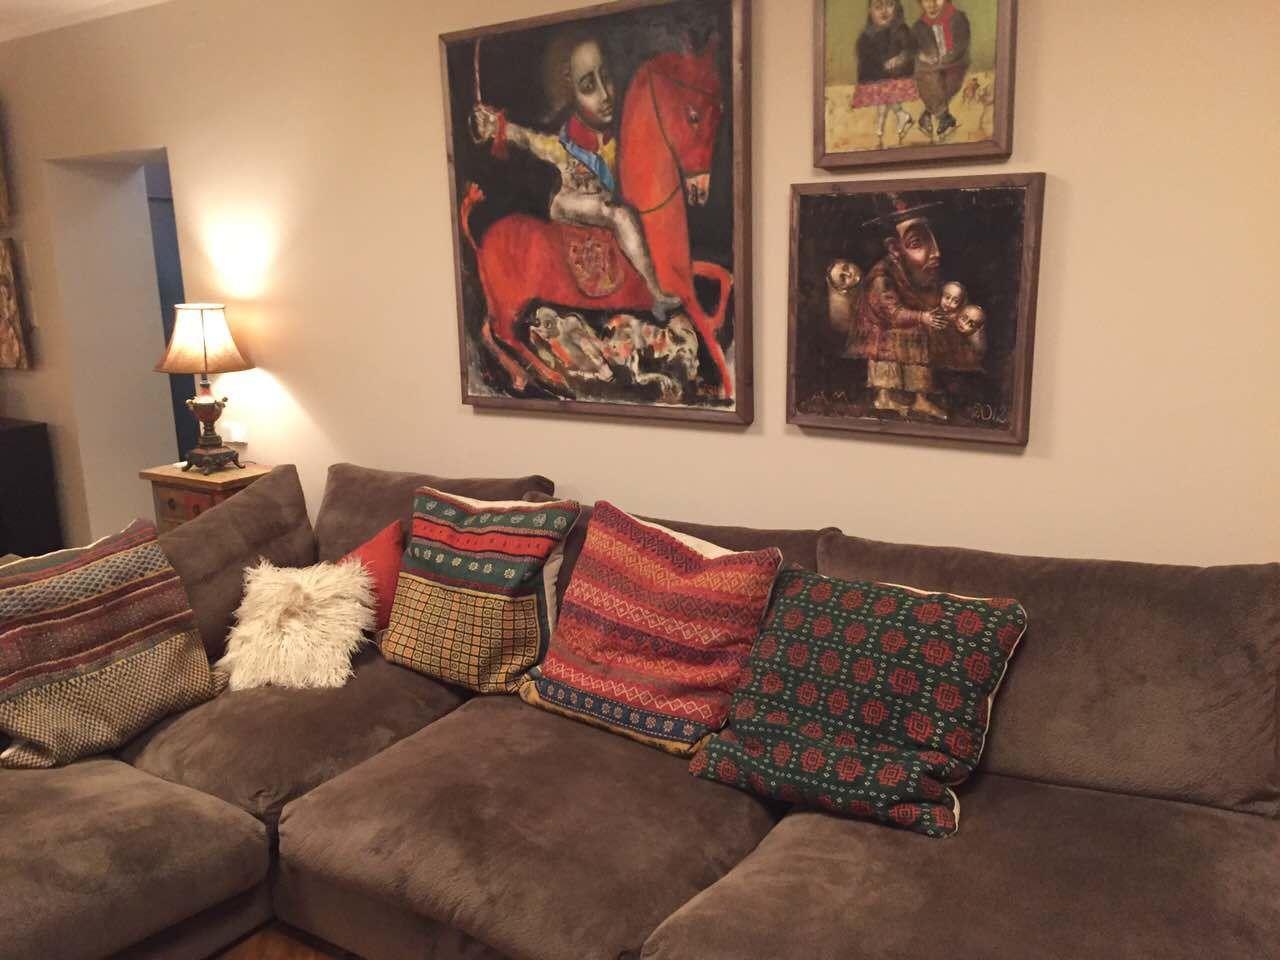 deko furniture. Serbian Family Home In Moskow. Wooden Table, Living Room, Icons, Wood, Deko Furniture D